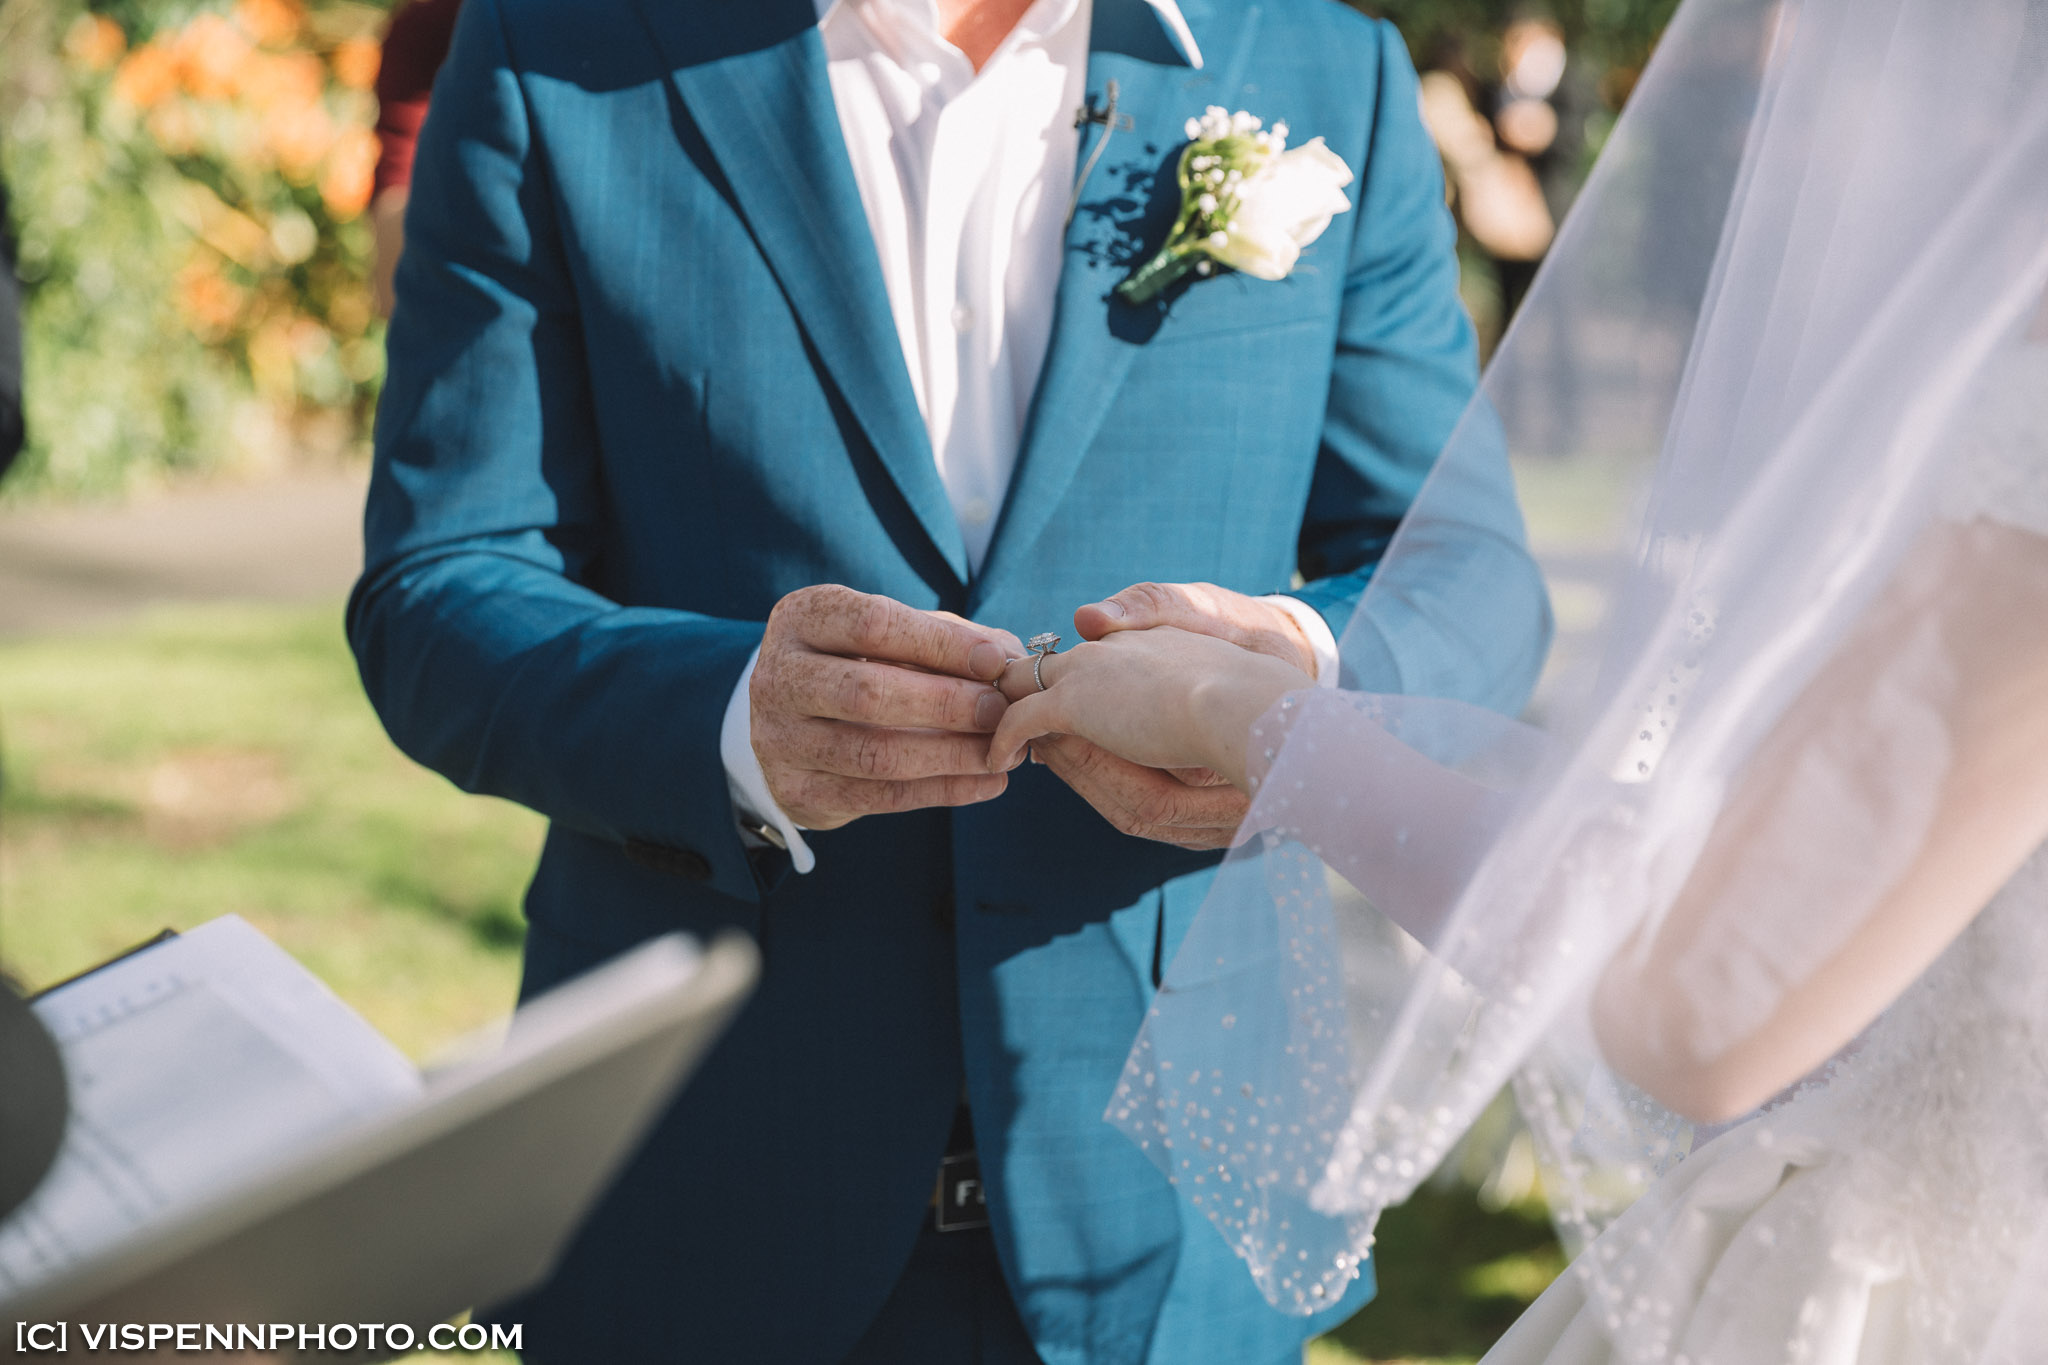 WEDDING DAY Photography Melbourne VISPENN 墨尔本 婚礼跟拍 婚礼摄像 婚礼摄影 结婚照 登记照 VISPENN 1P 1DX 01221